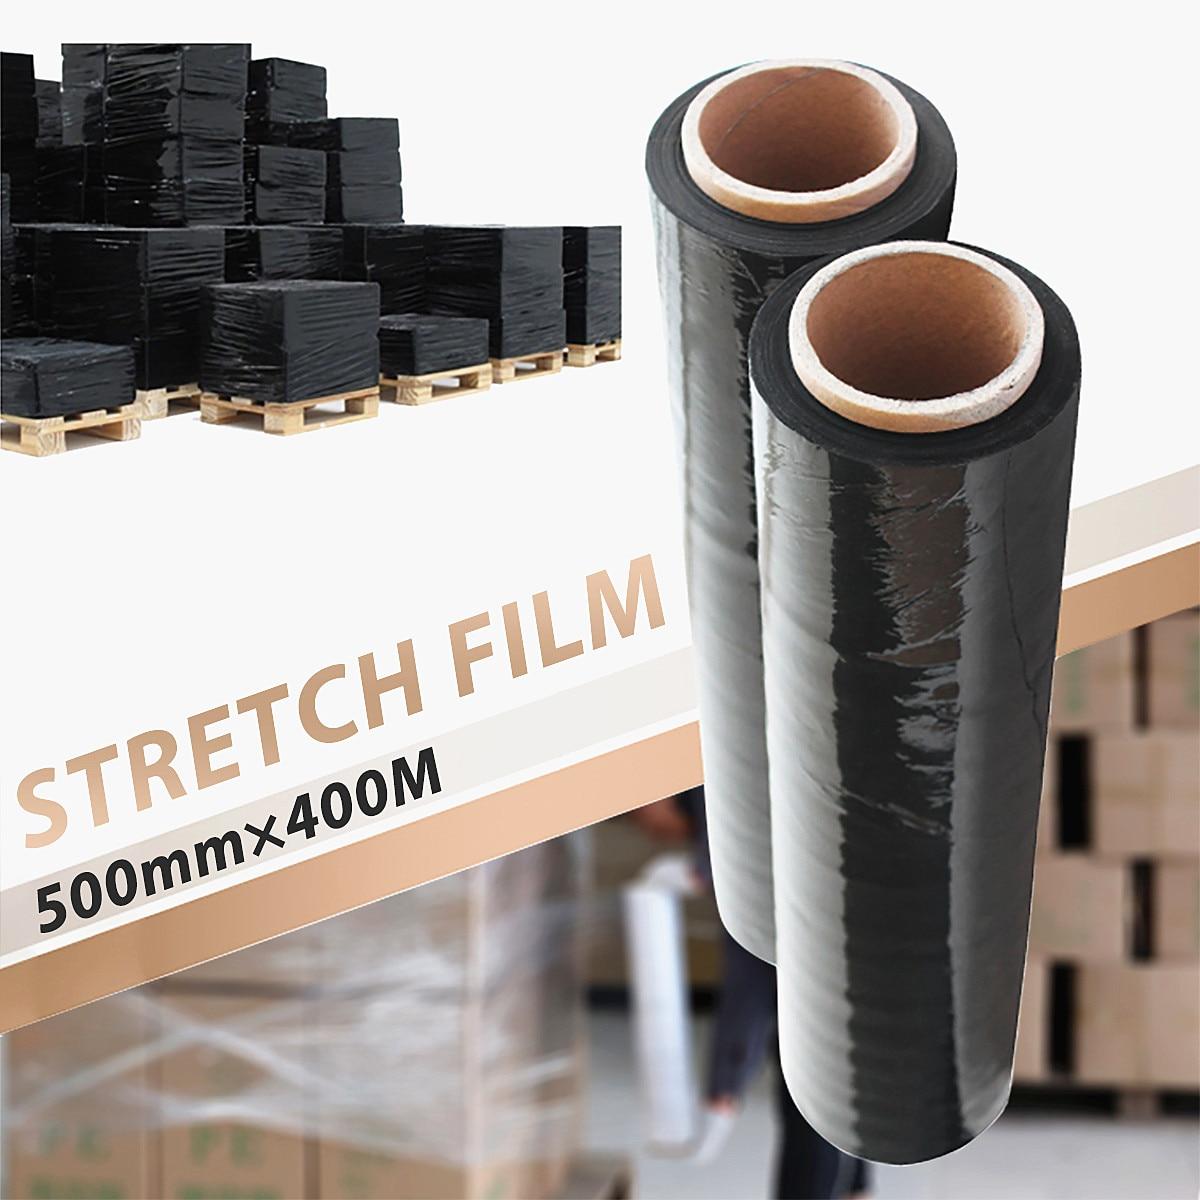 1Pcs 500mmx400M Black Stretch Film PE For Carton Pallet Shrink Wrap Packing1Pcs 500mmx400M Black Stretch Film PE For Carton Pallet Shrink Wrap Packing